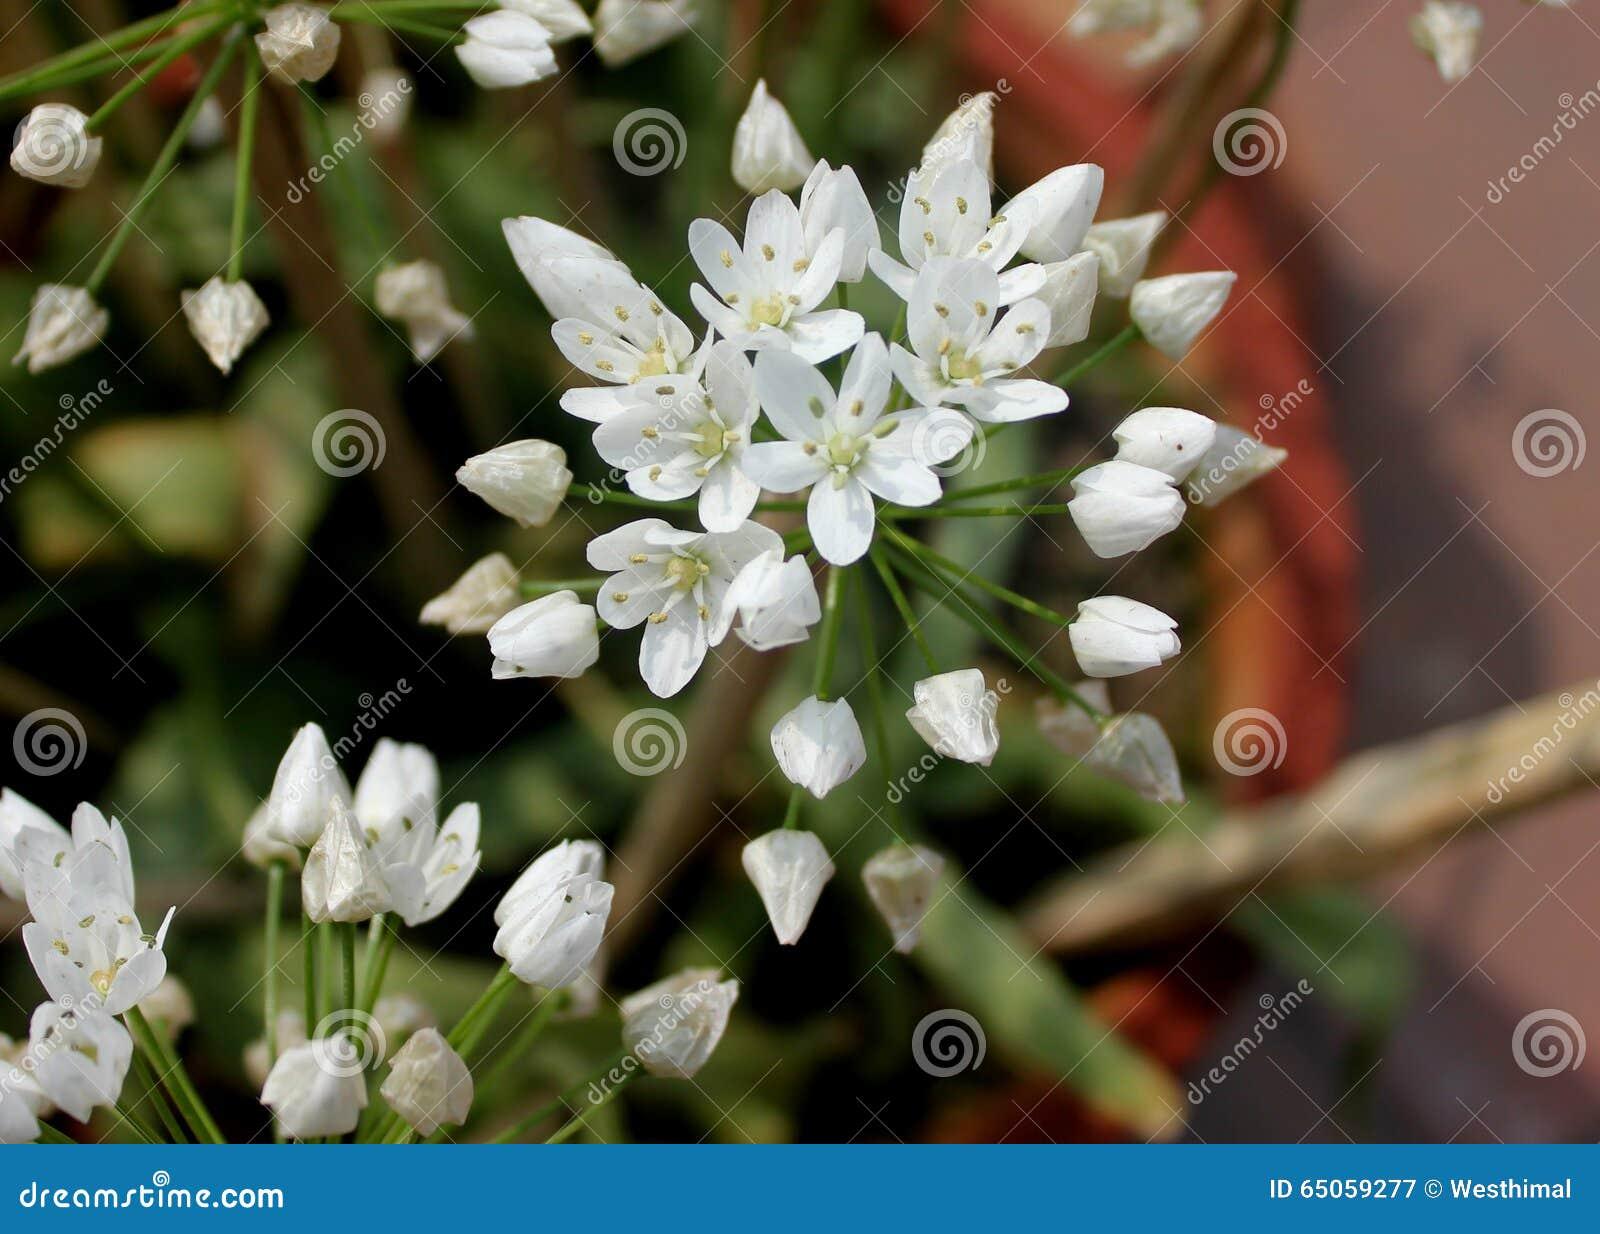 Ornithogallum umbellatum star of bethlehem stock photo for Grass like flowering plants